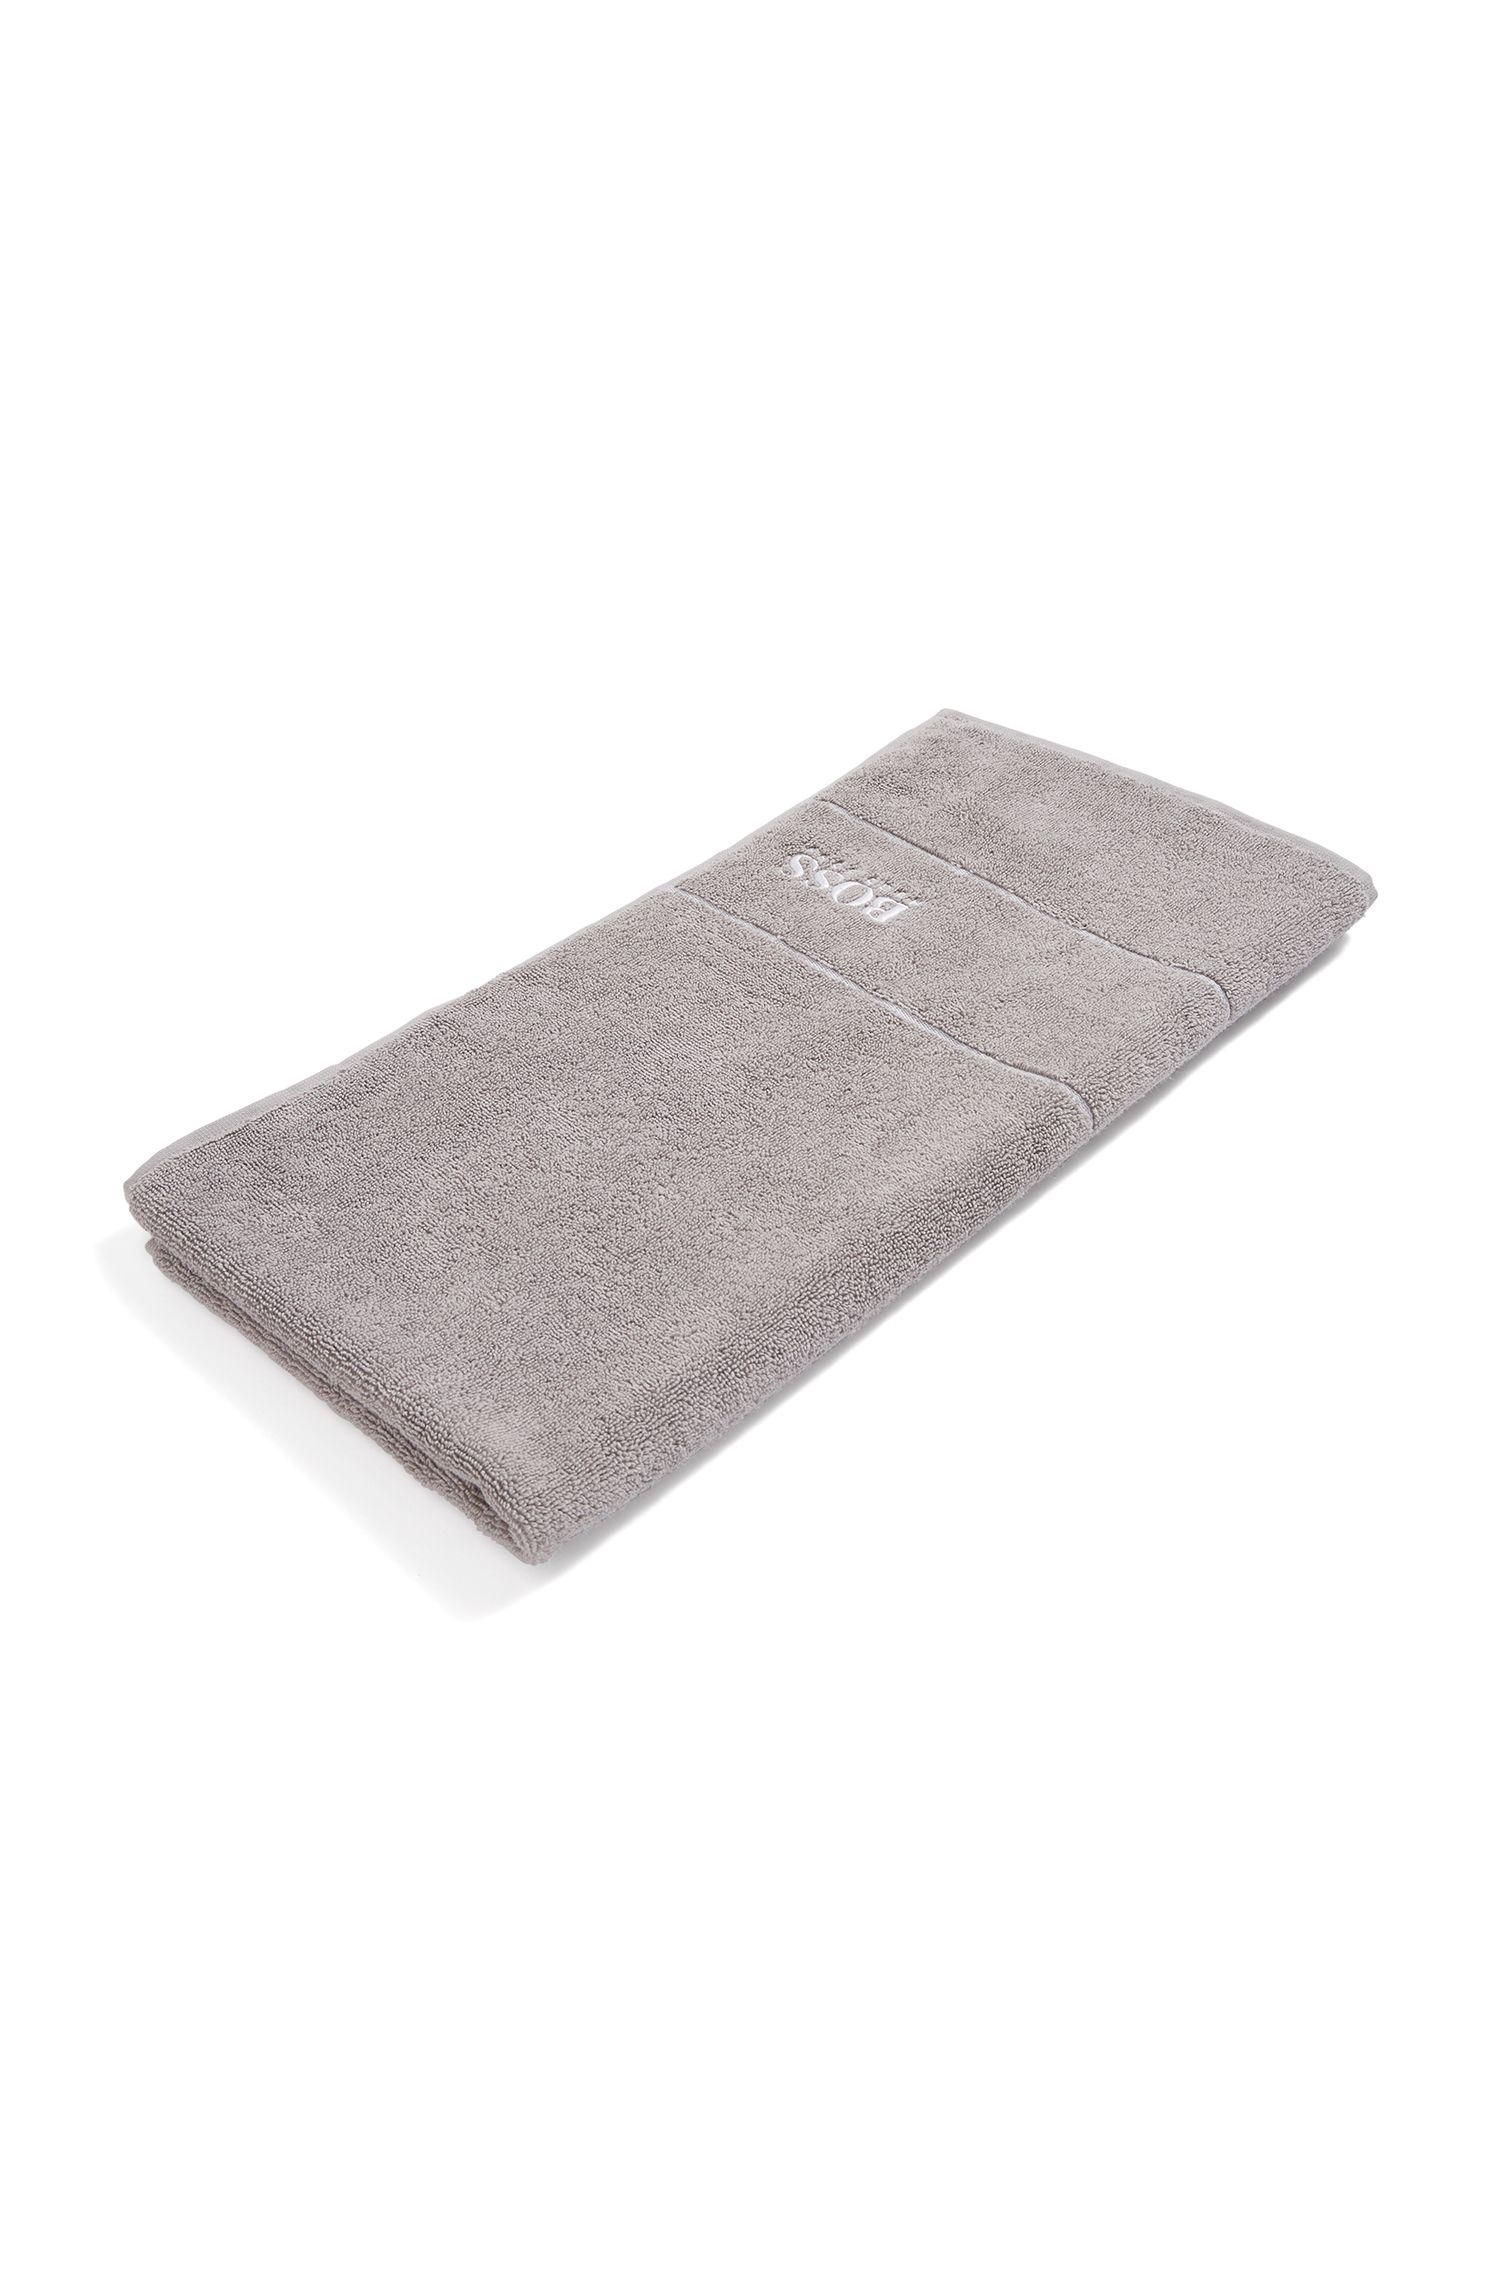 Finest Egyptian cotton hand towel with logo border, Dark Grey